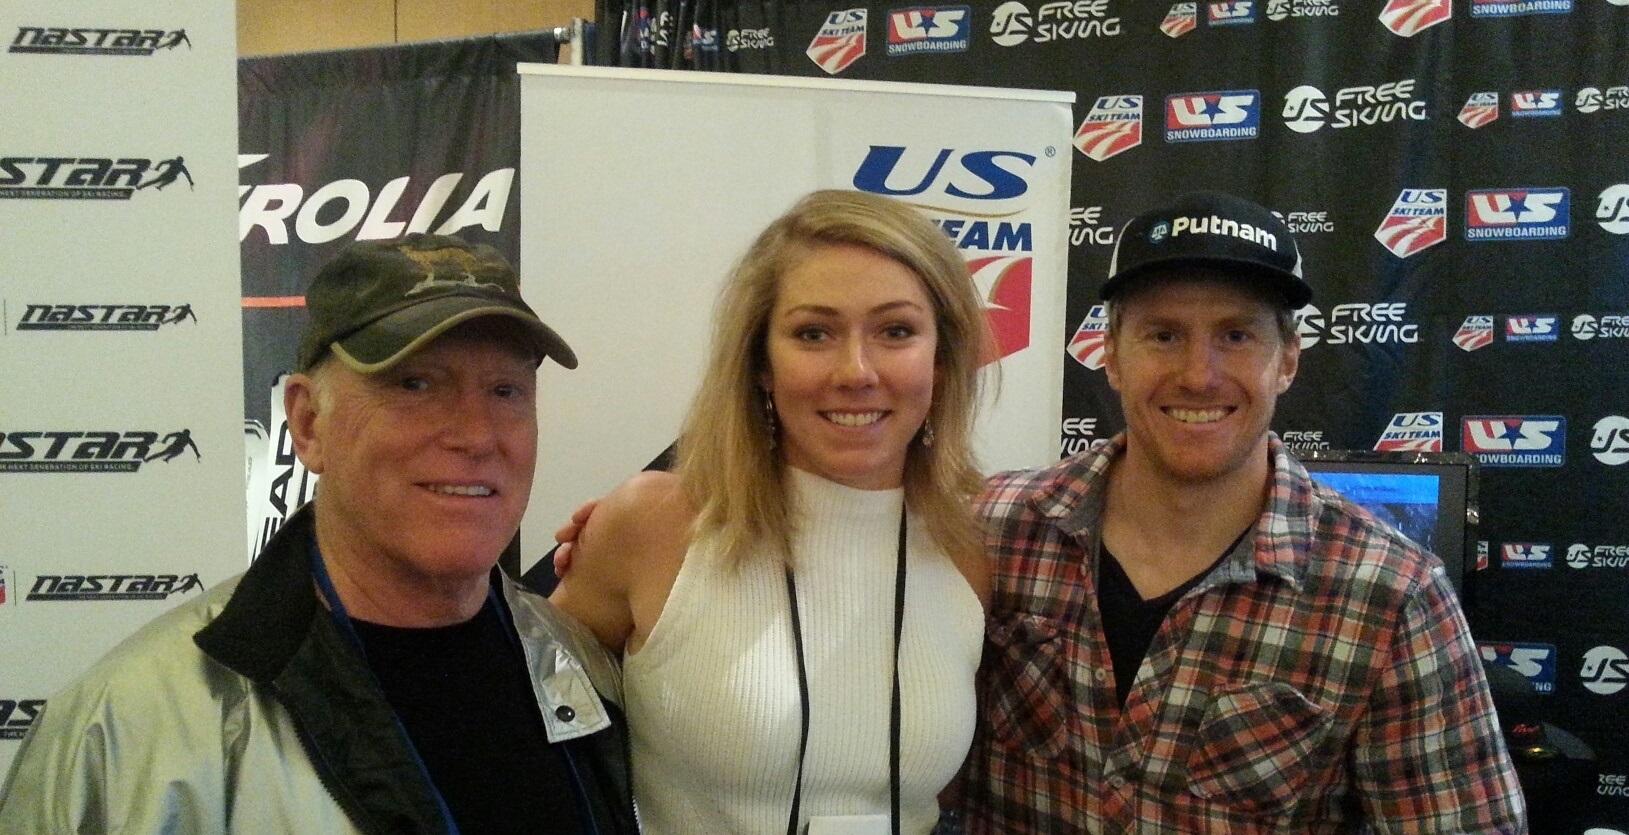 Cary with Mikaela Shiffrin, Ted Ligety